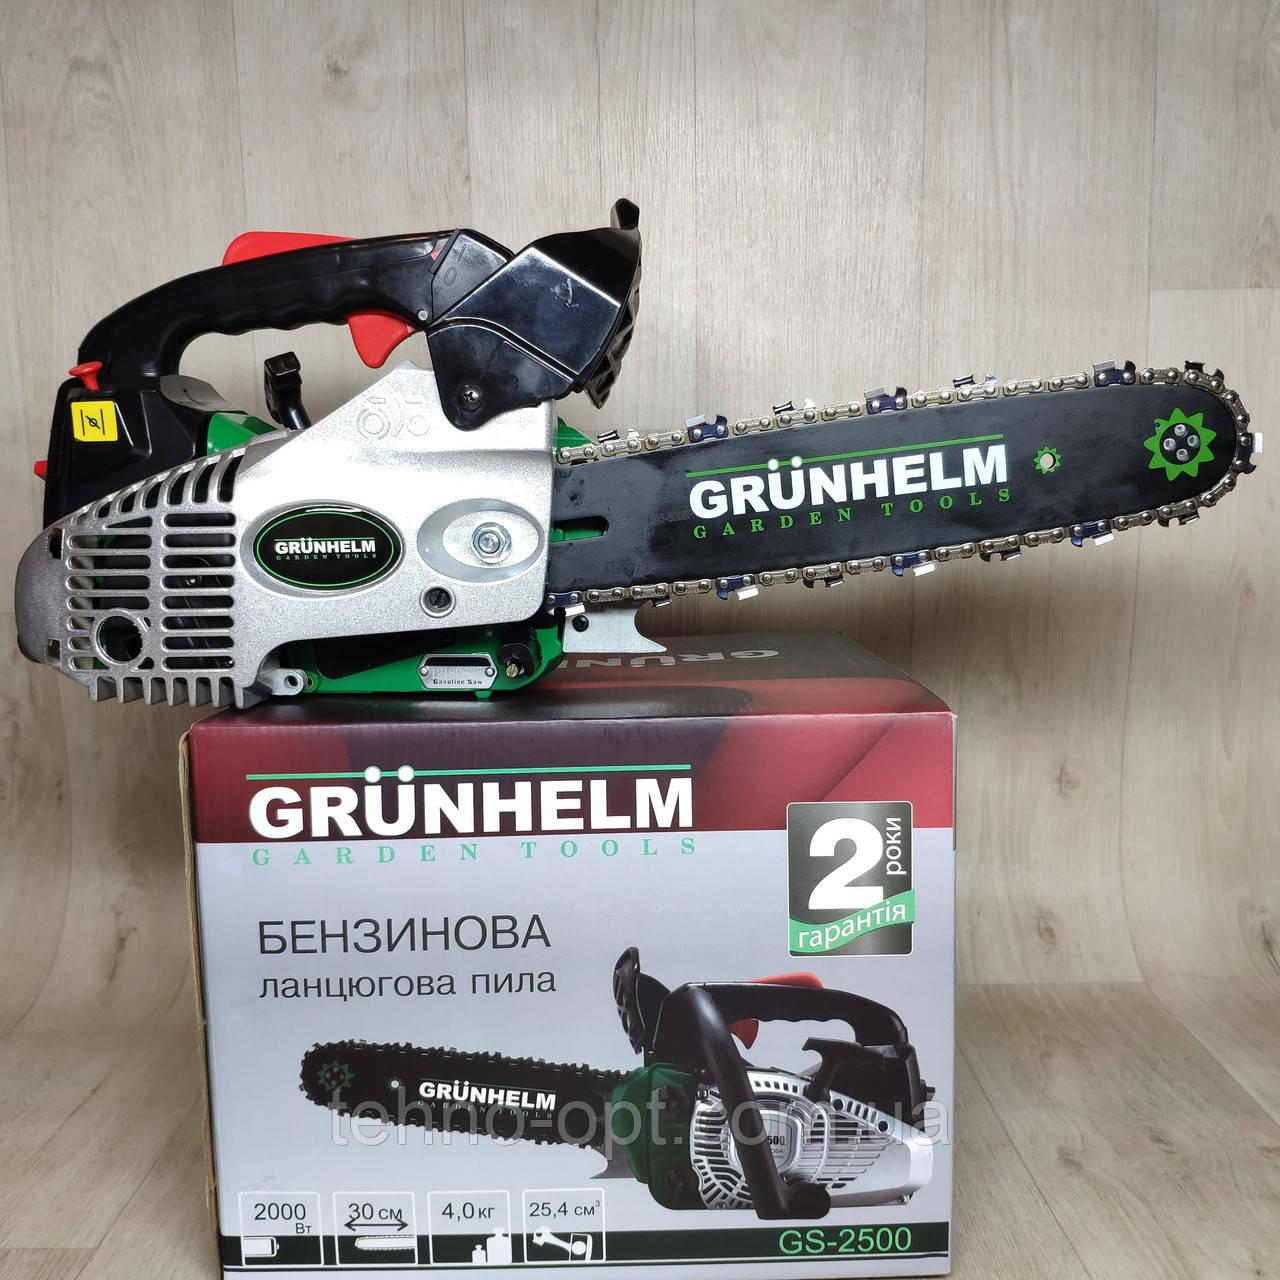 Одноручная Бензопила Grunhelm GS-2500 Сучкорез